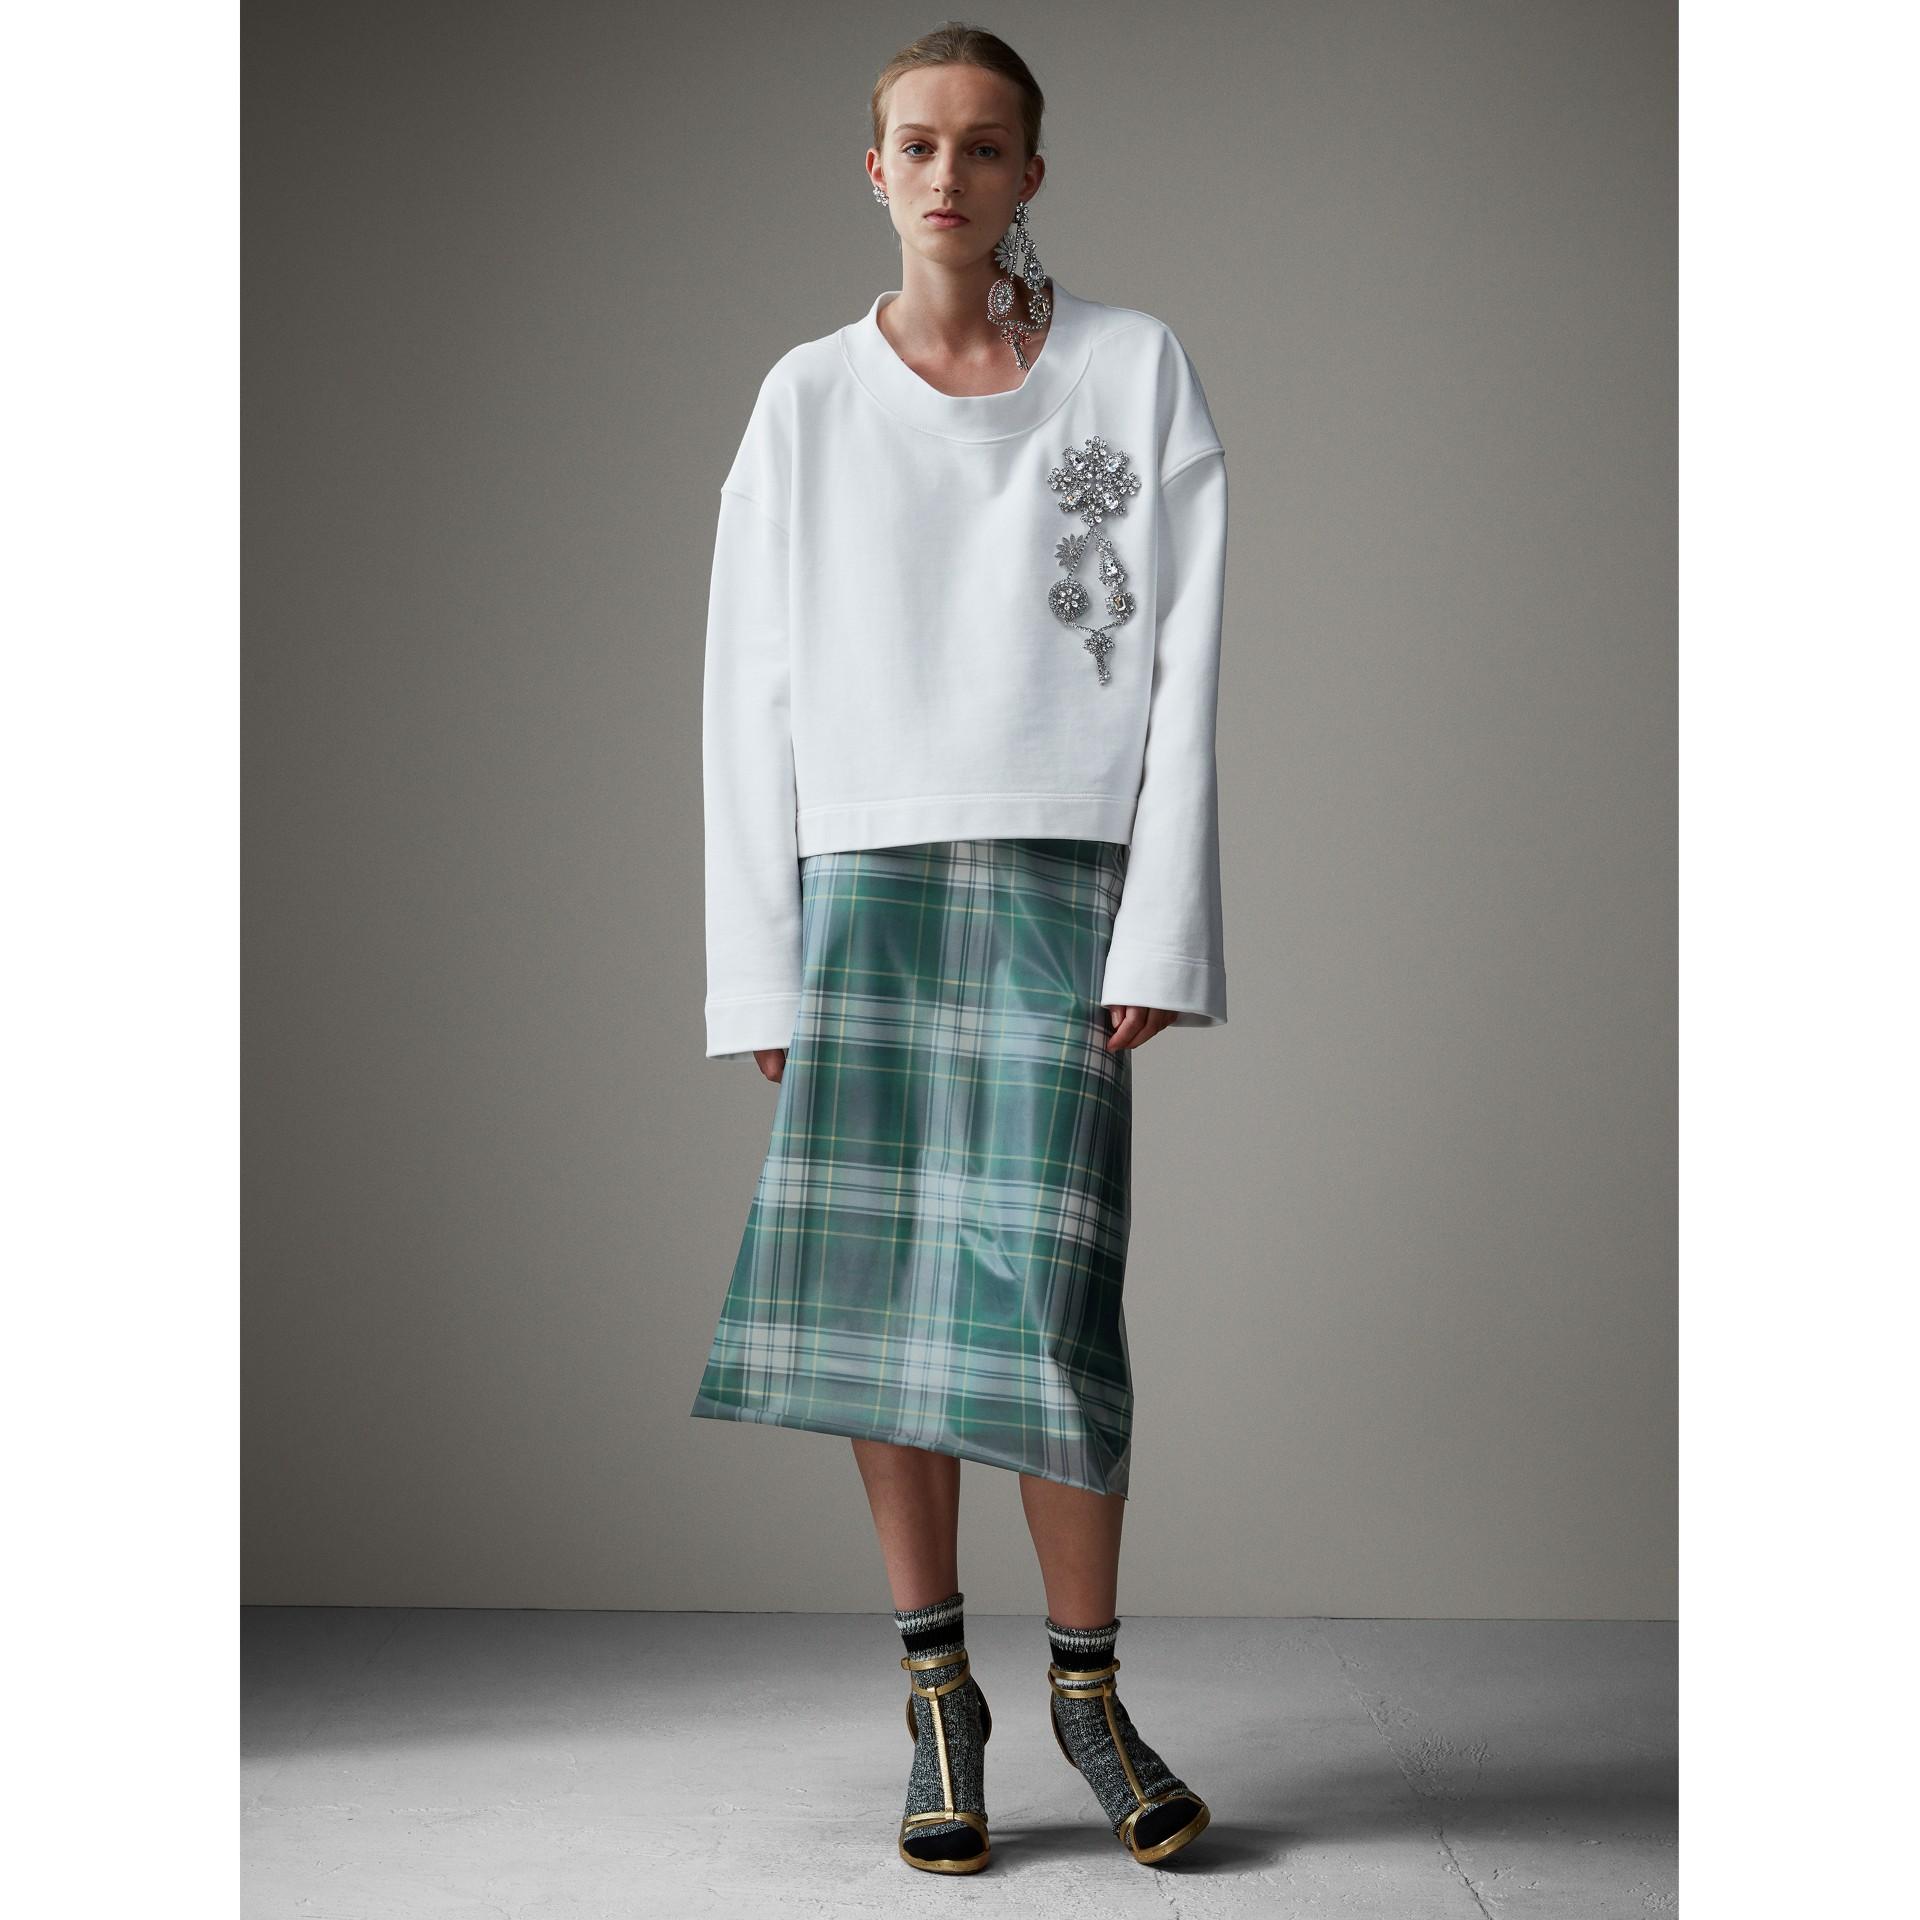 Kurzes Sweatshirt mit Kristallbrosche (Optic-weiss) - Damen | Burberry - Galerie-Bild 5